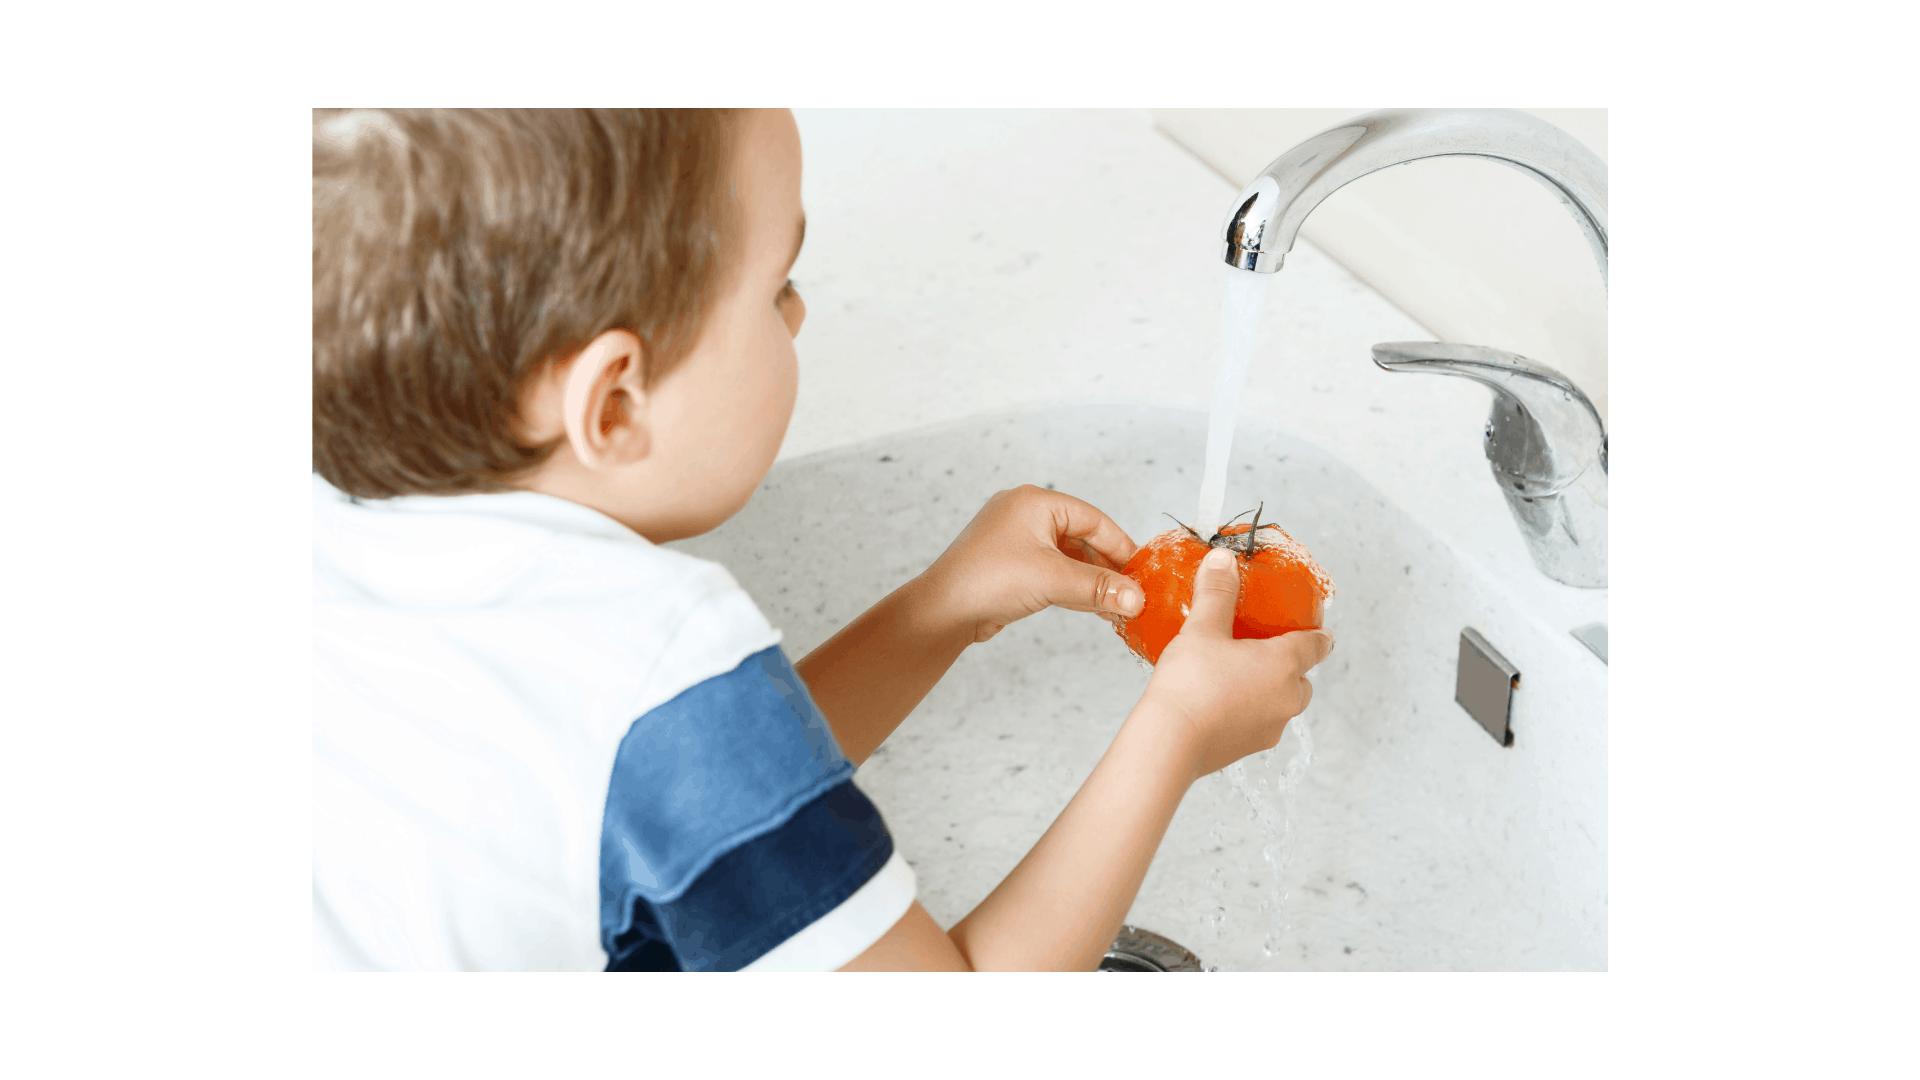 child washing tomato in the kitchen